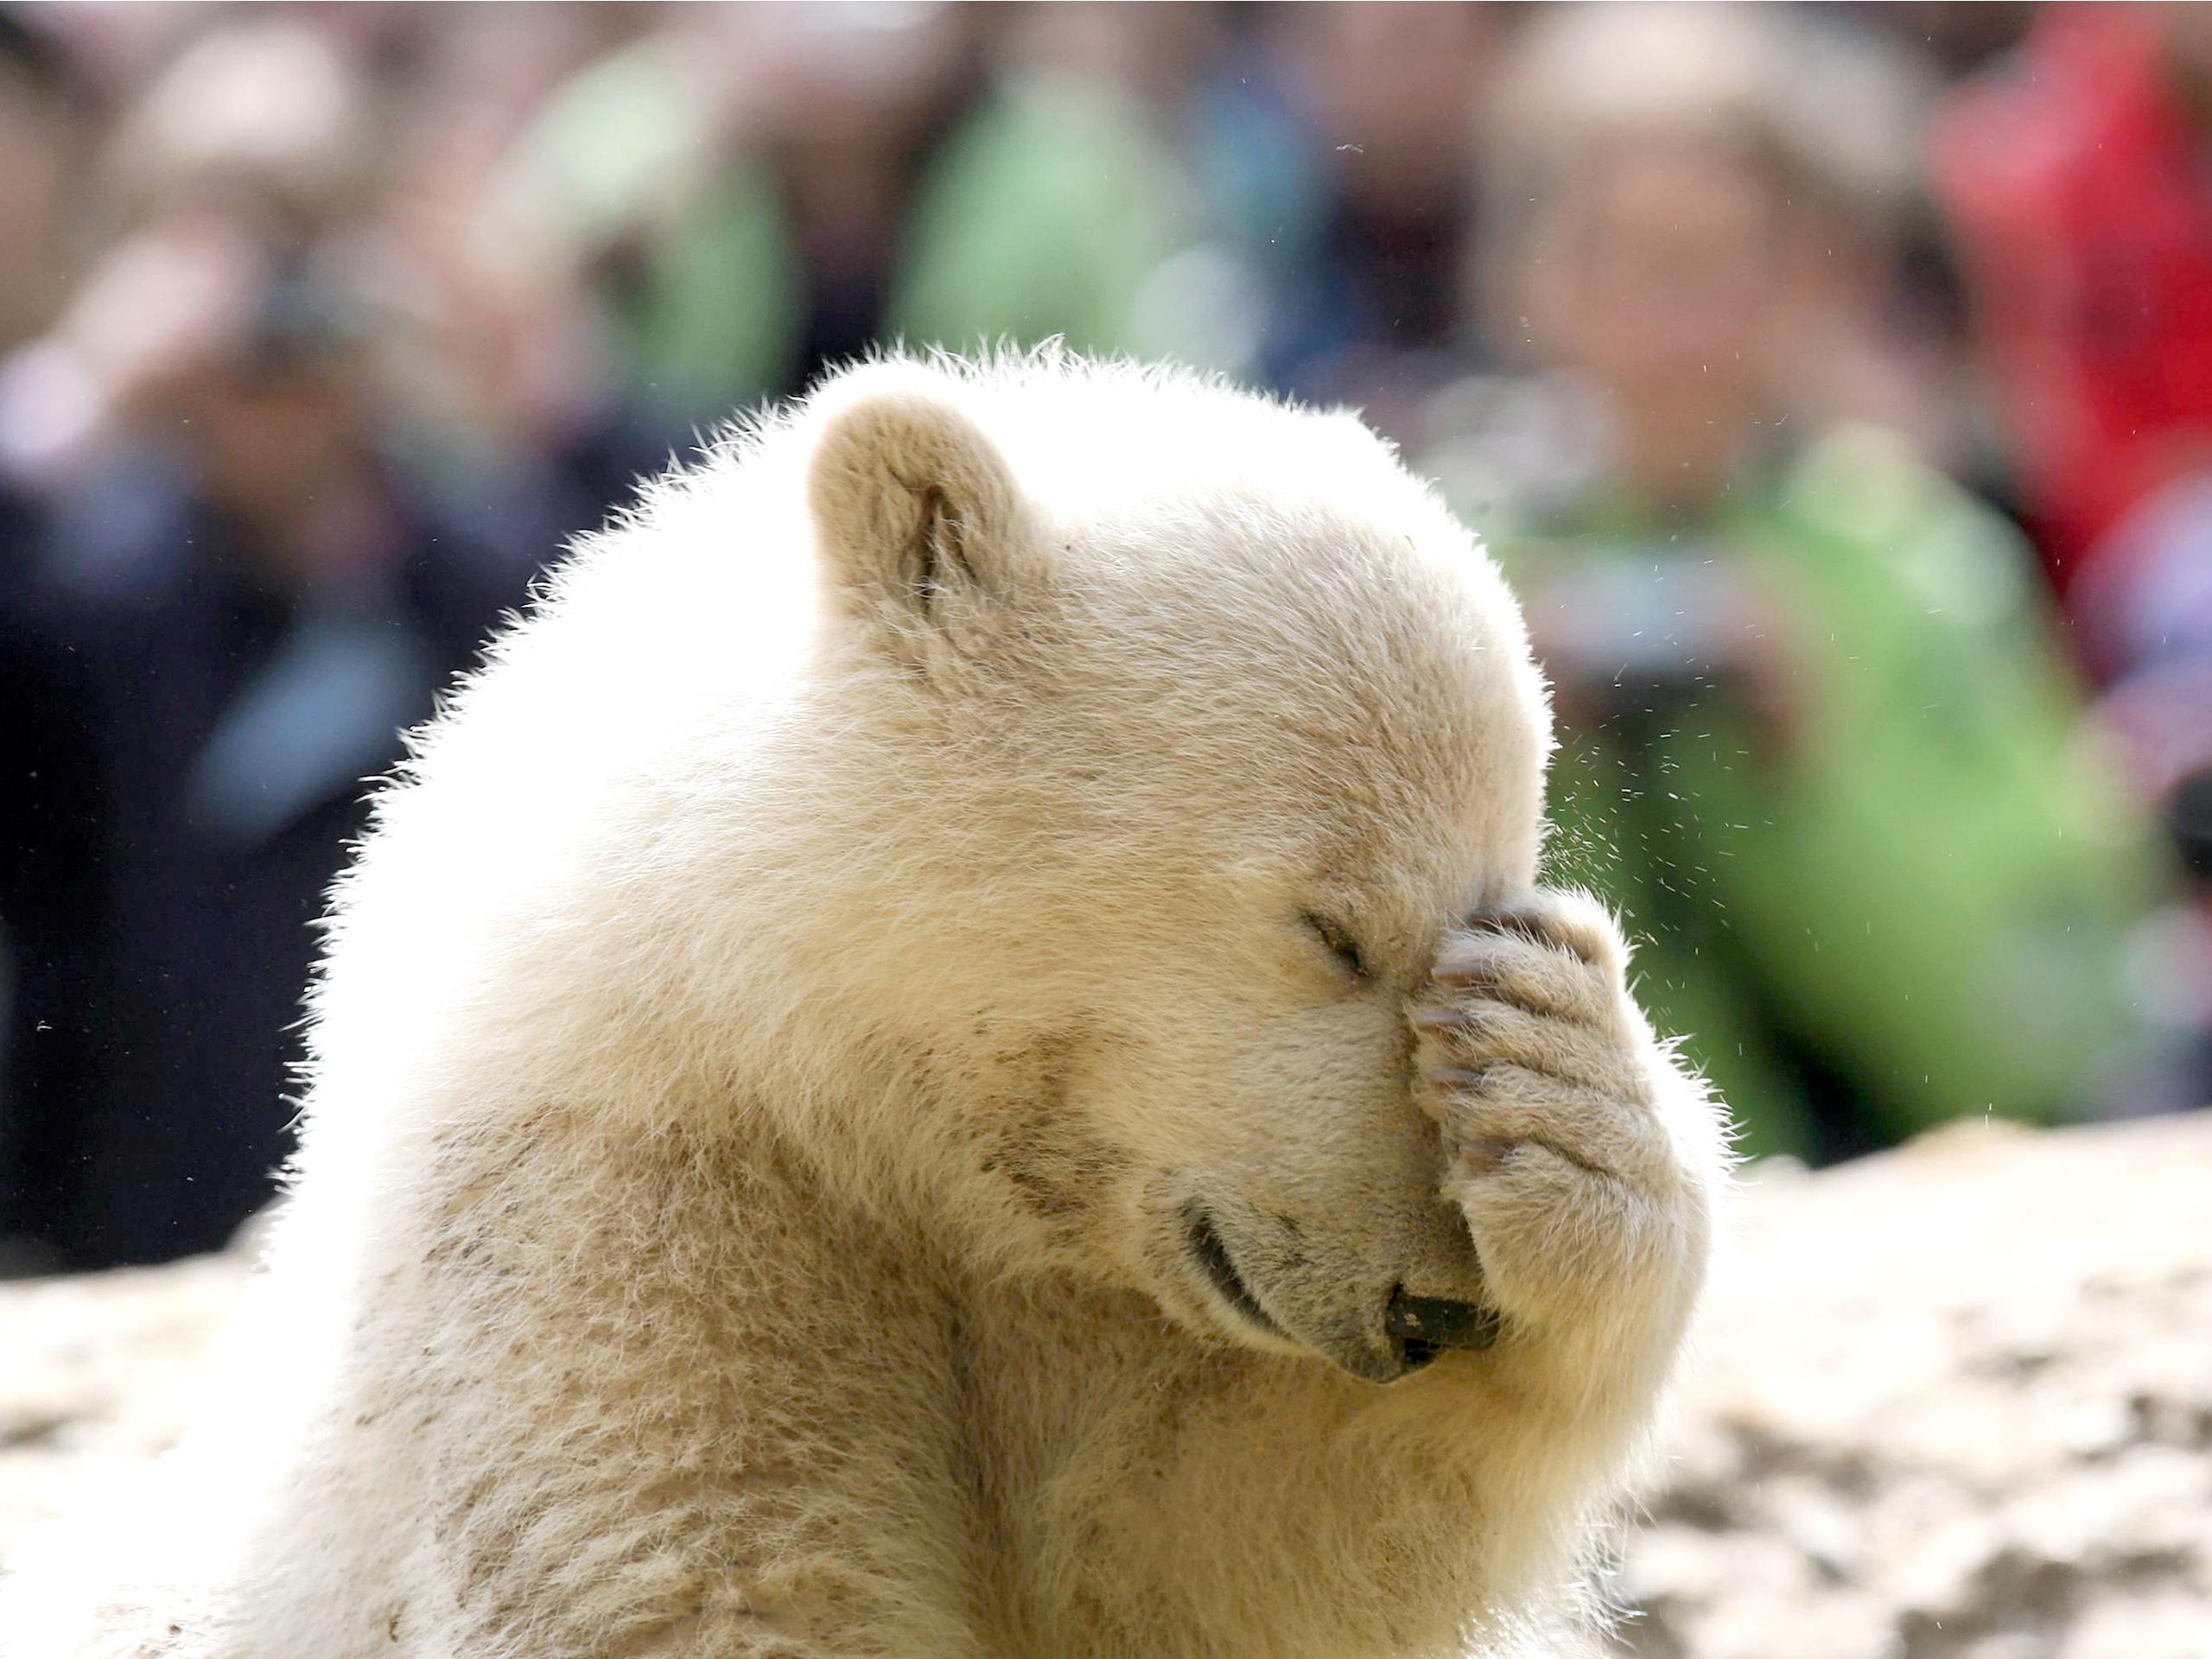 Sad Cute Baby Hd Wallpaper Knut Polar Bear Hd Desktop Wallpaper